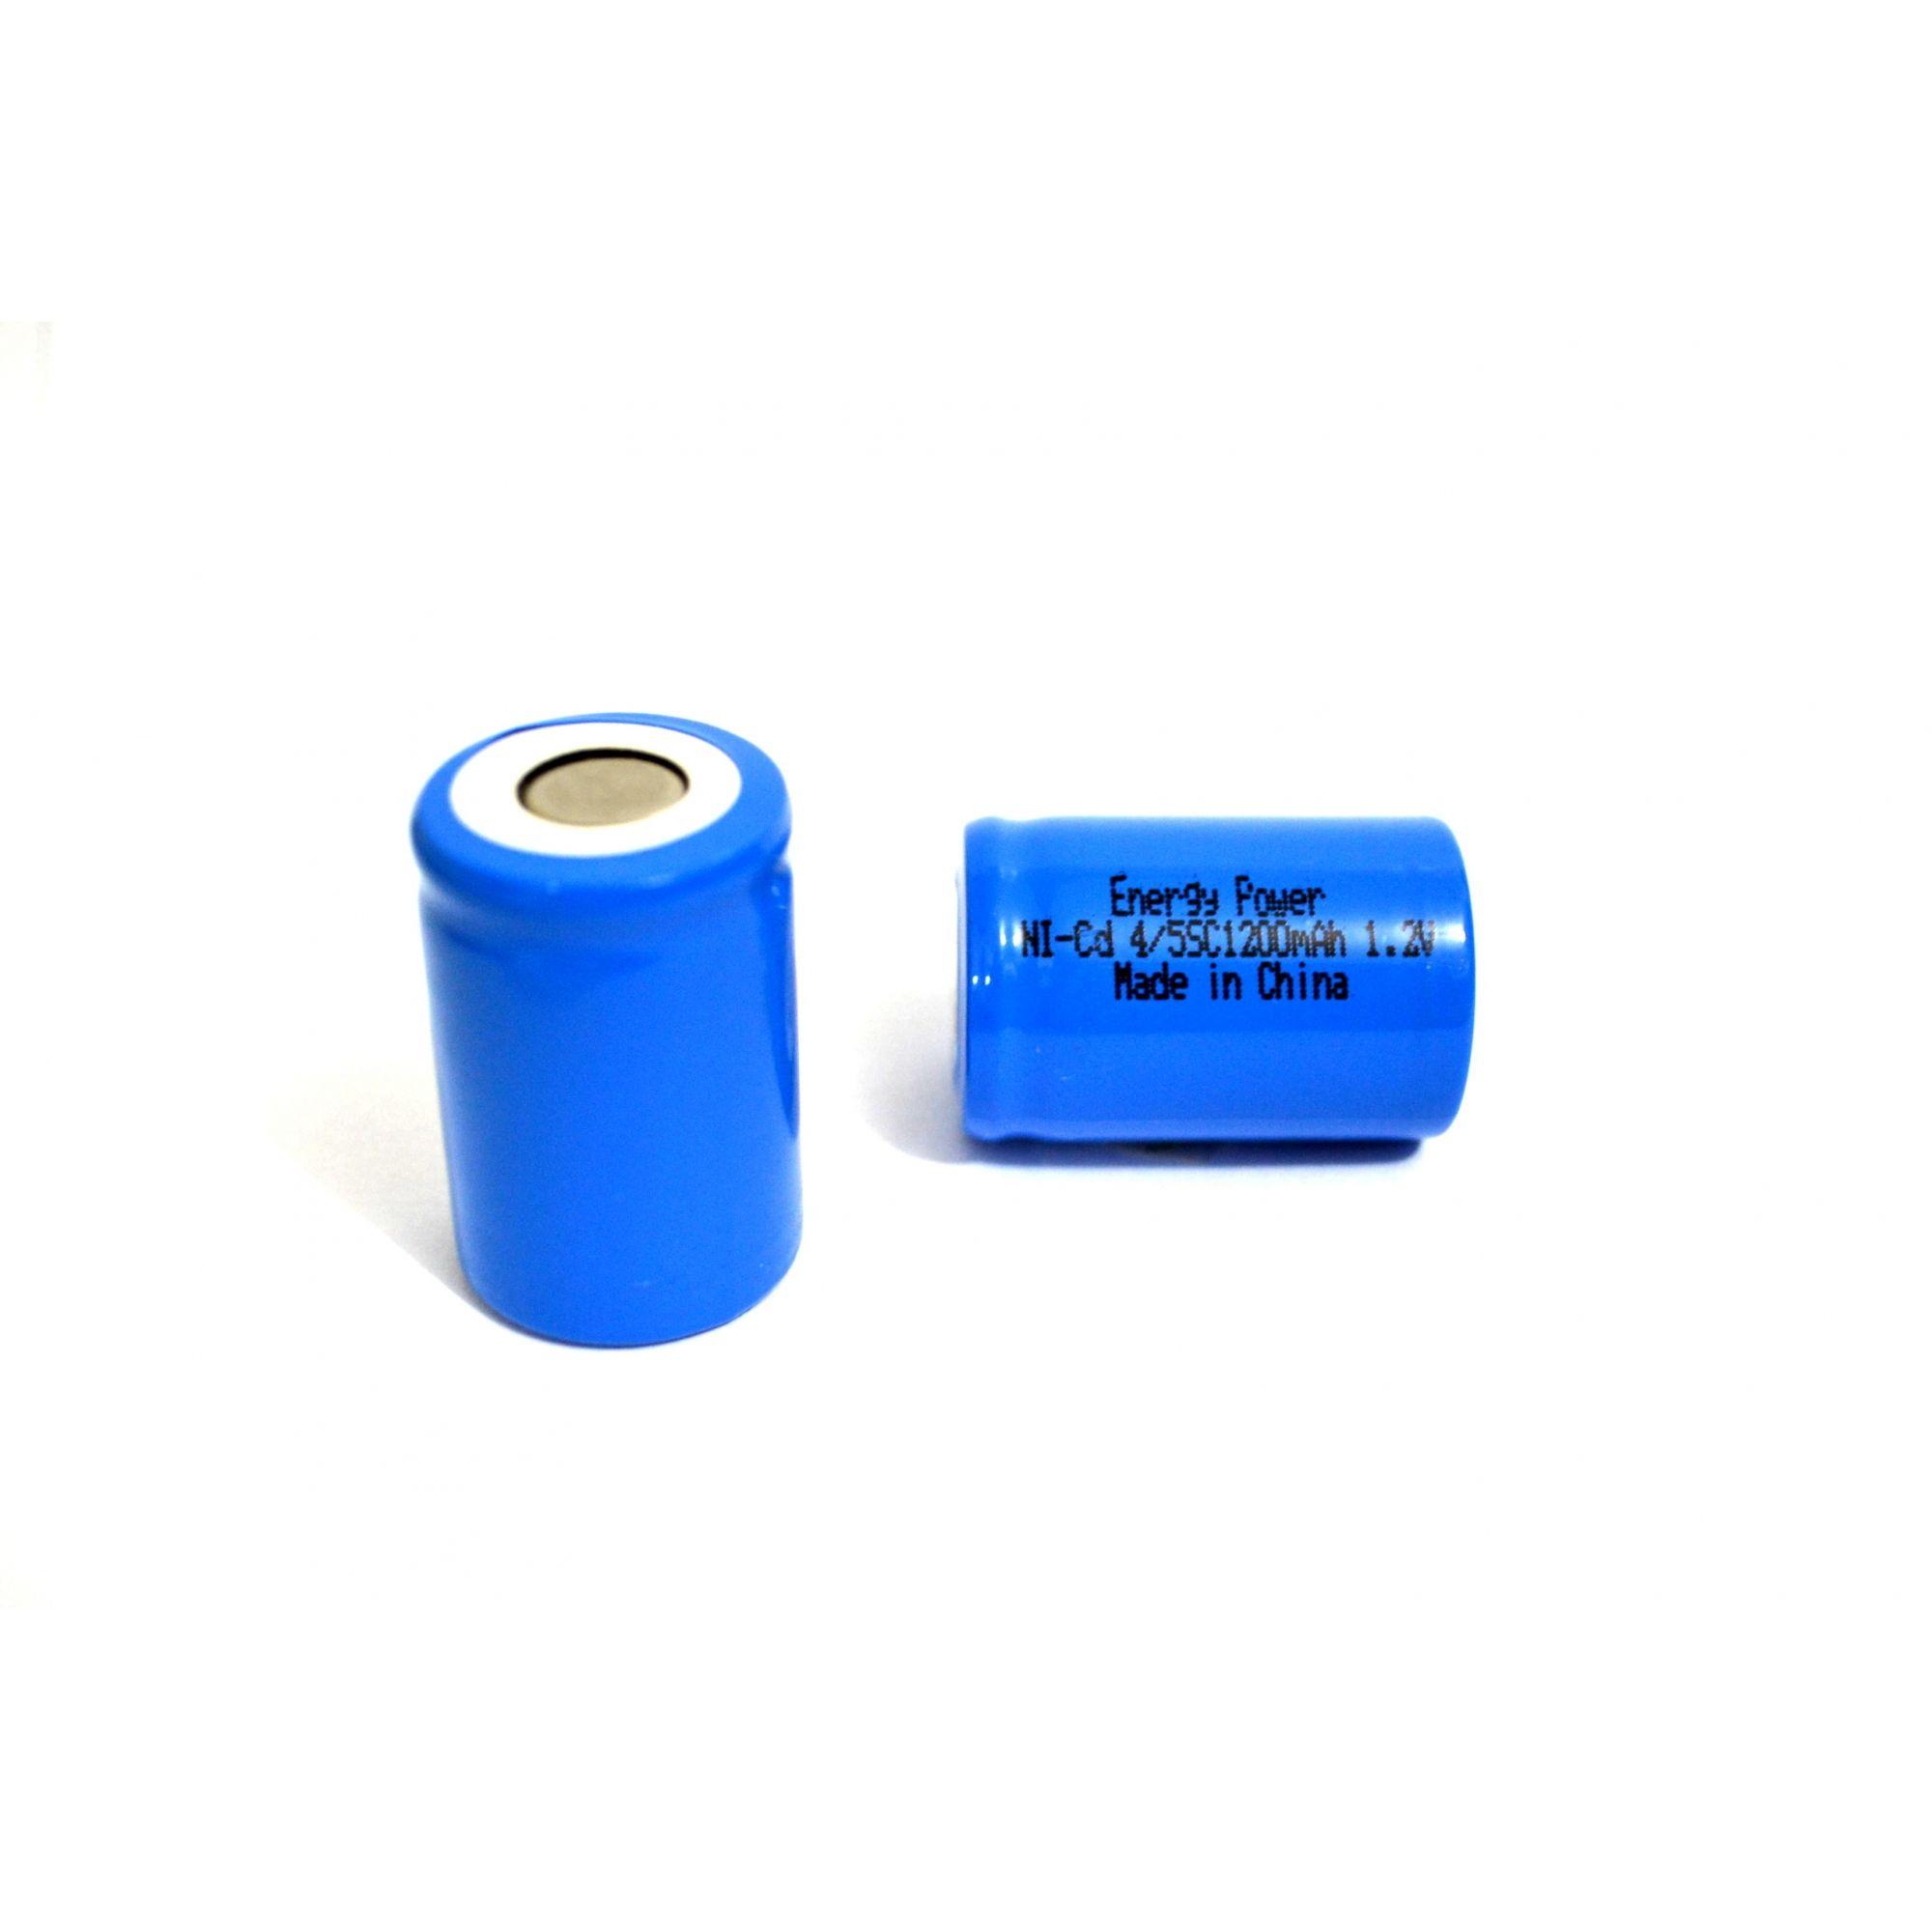 BATERIA ENERGY POWER 4/5SC 1200MAH 1,2V NI-CD